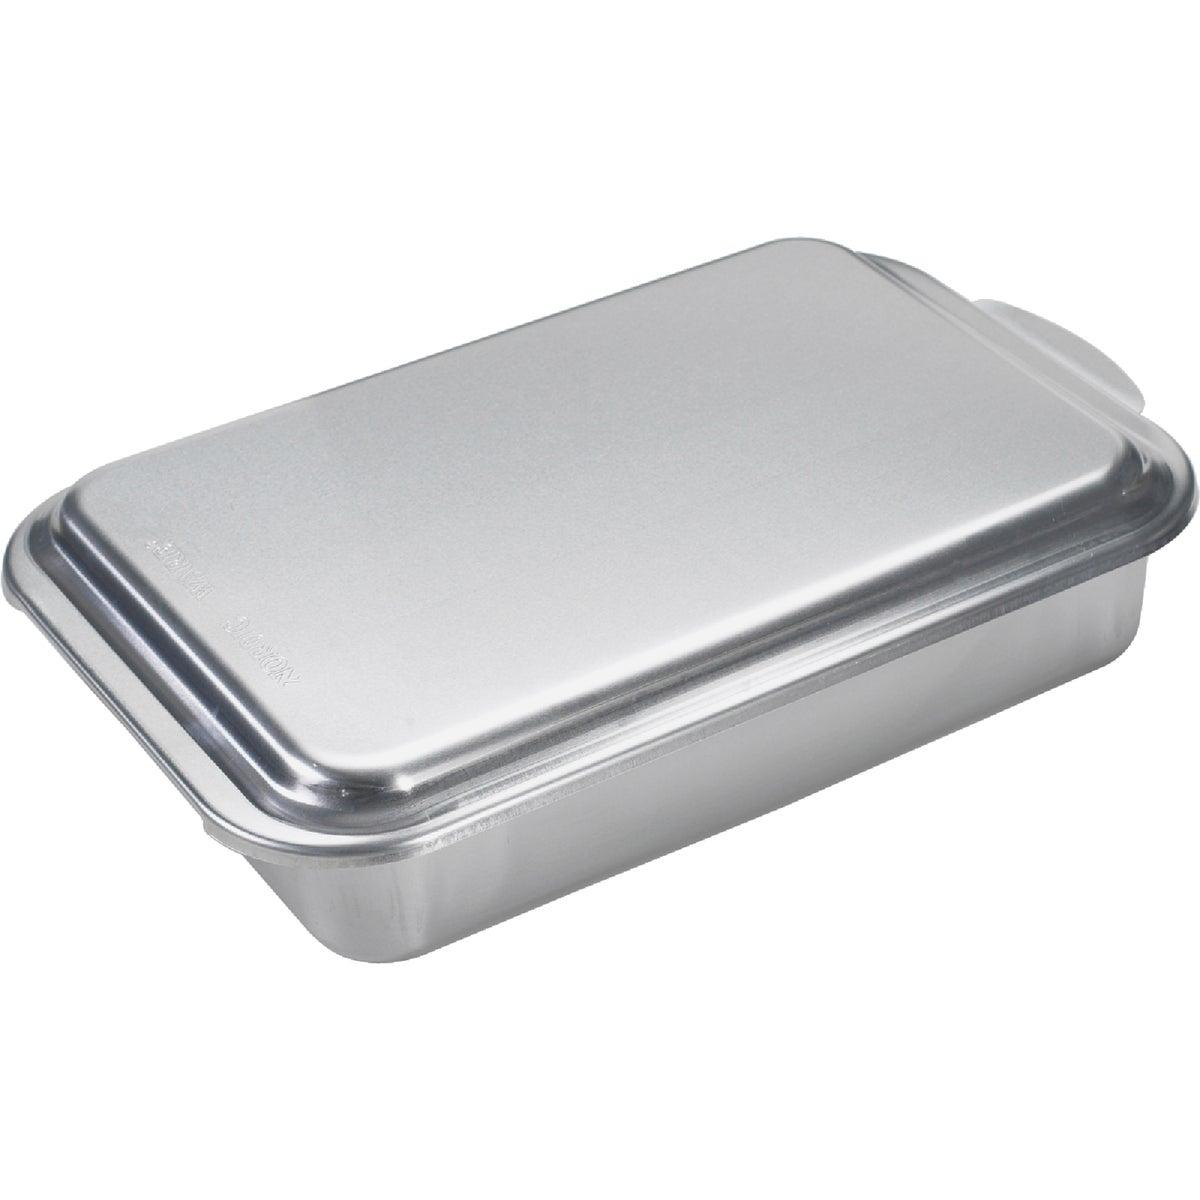 9X13 METL CAKE PAN W/LID - 46320 by Nordic Ware/reitenba